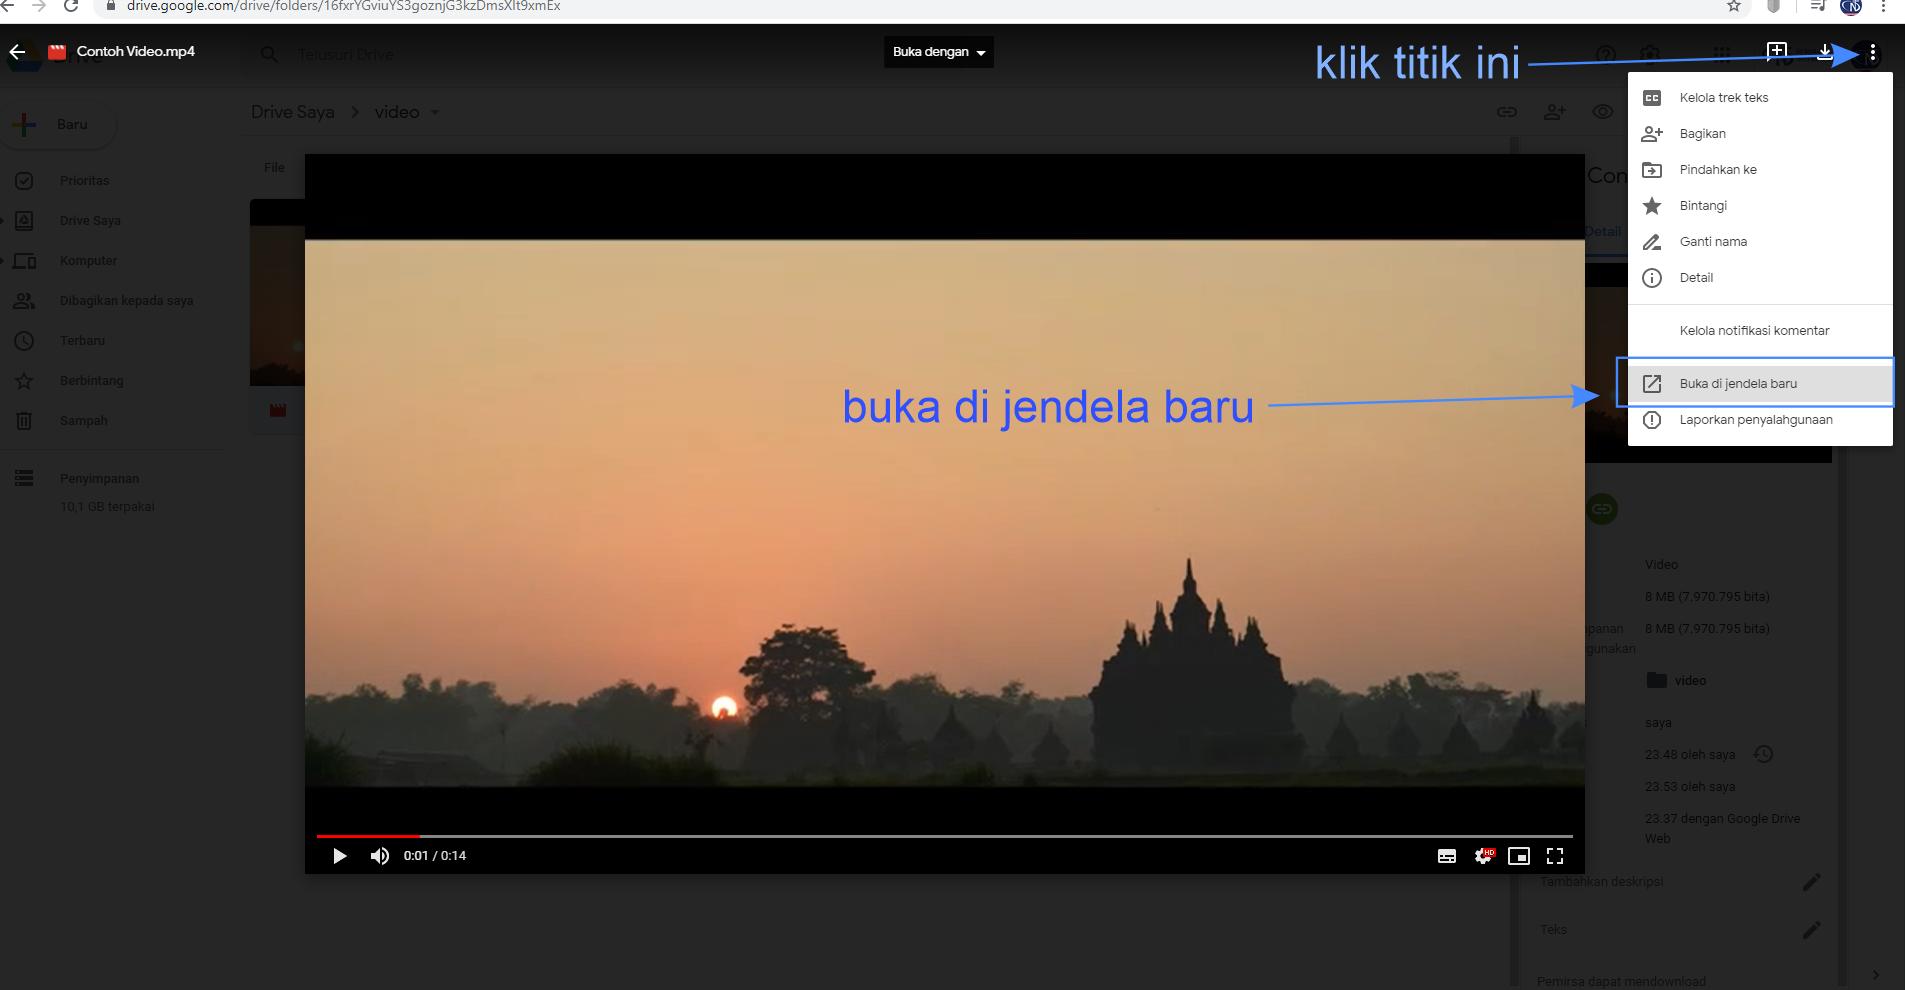 Cara Menambah Video Ke Elearning Dari Google Drive Knowledge Base